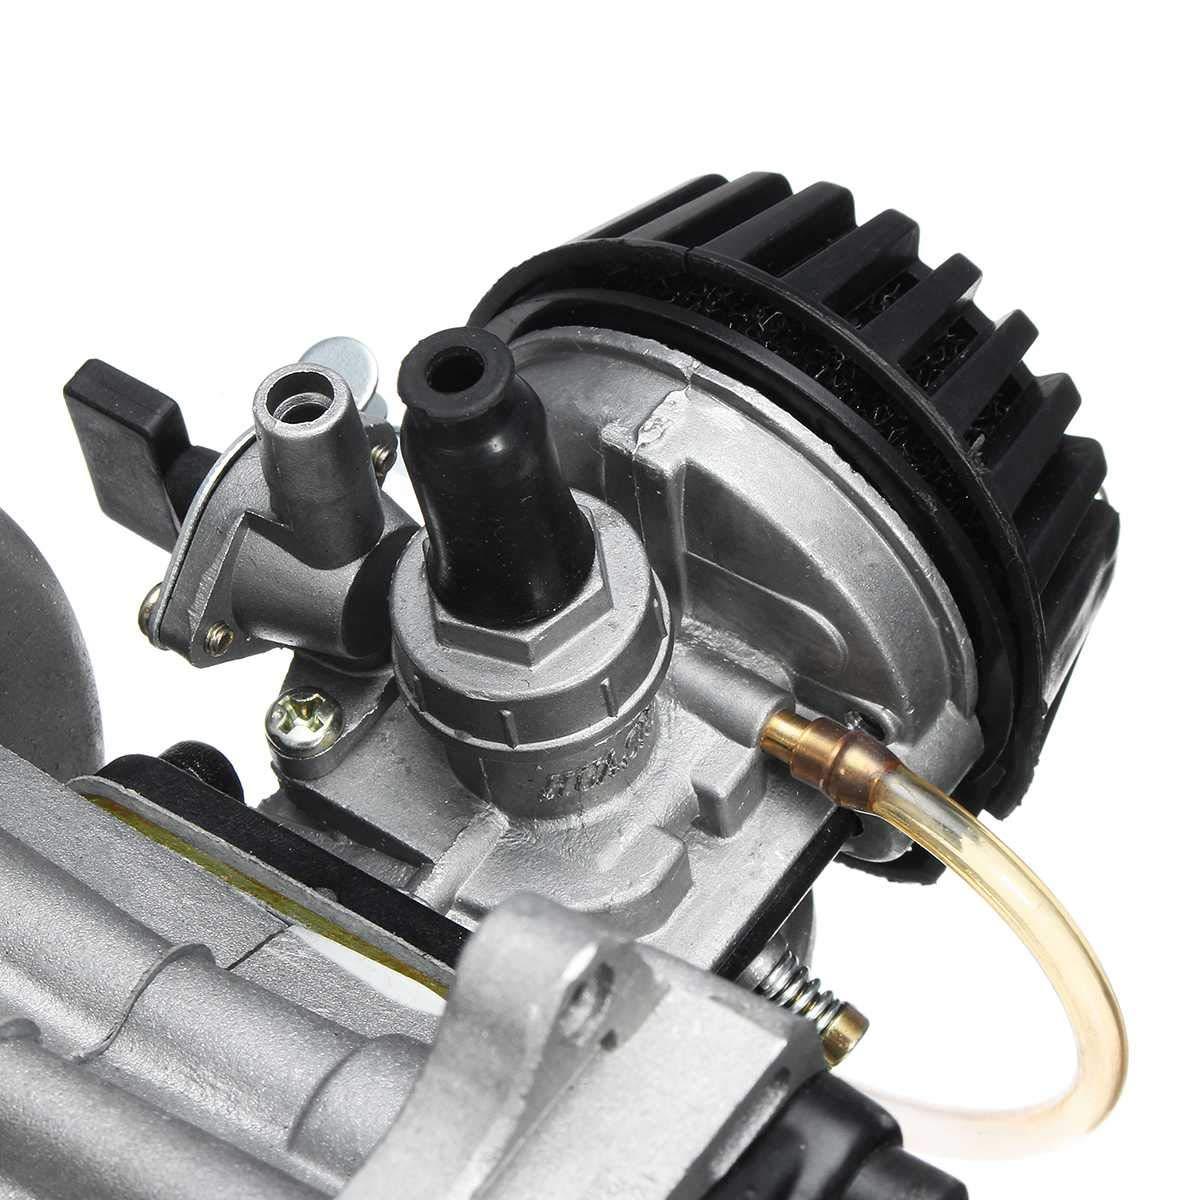 49cc 2-Stroke CDI Hand Pull Start Engine Motor For Pocket Bike Mini Dirt Bike ATV Scooter by Unkows (Image #4)